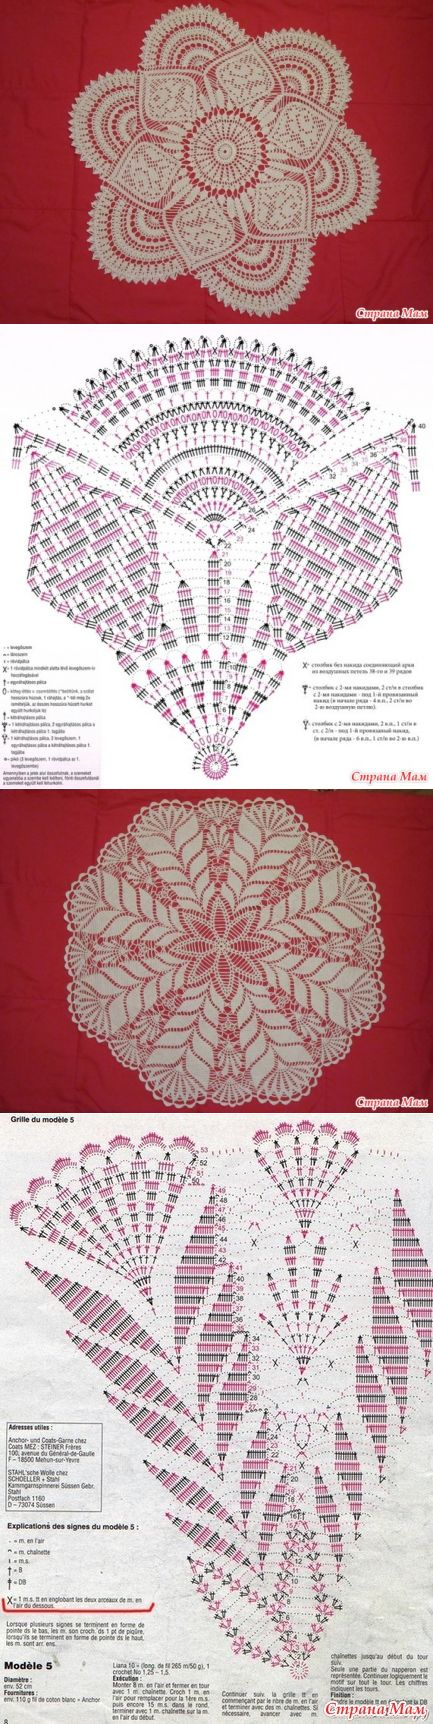 14 best Manteles crochet images on Pinterest | Crochet doilies ...